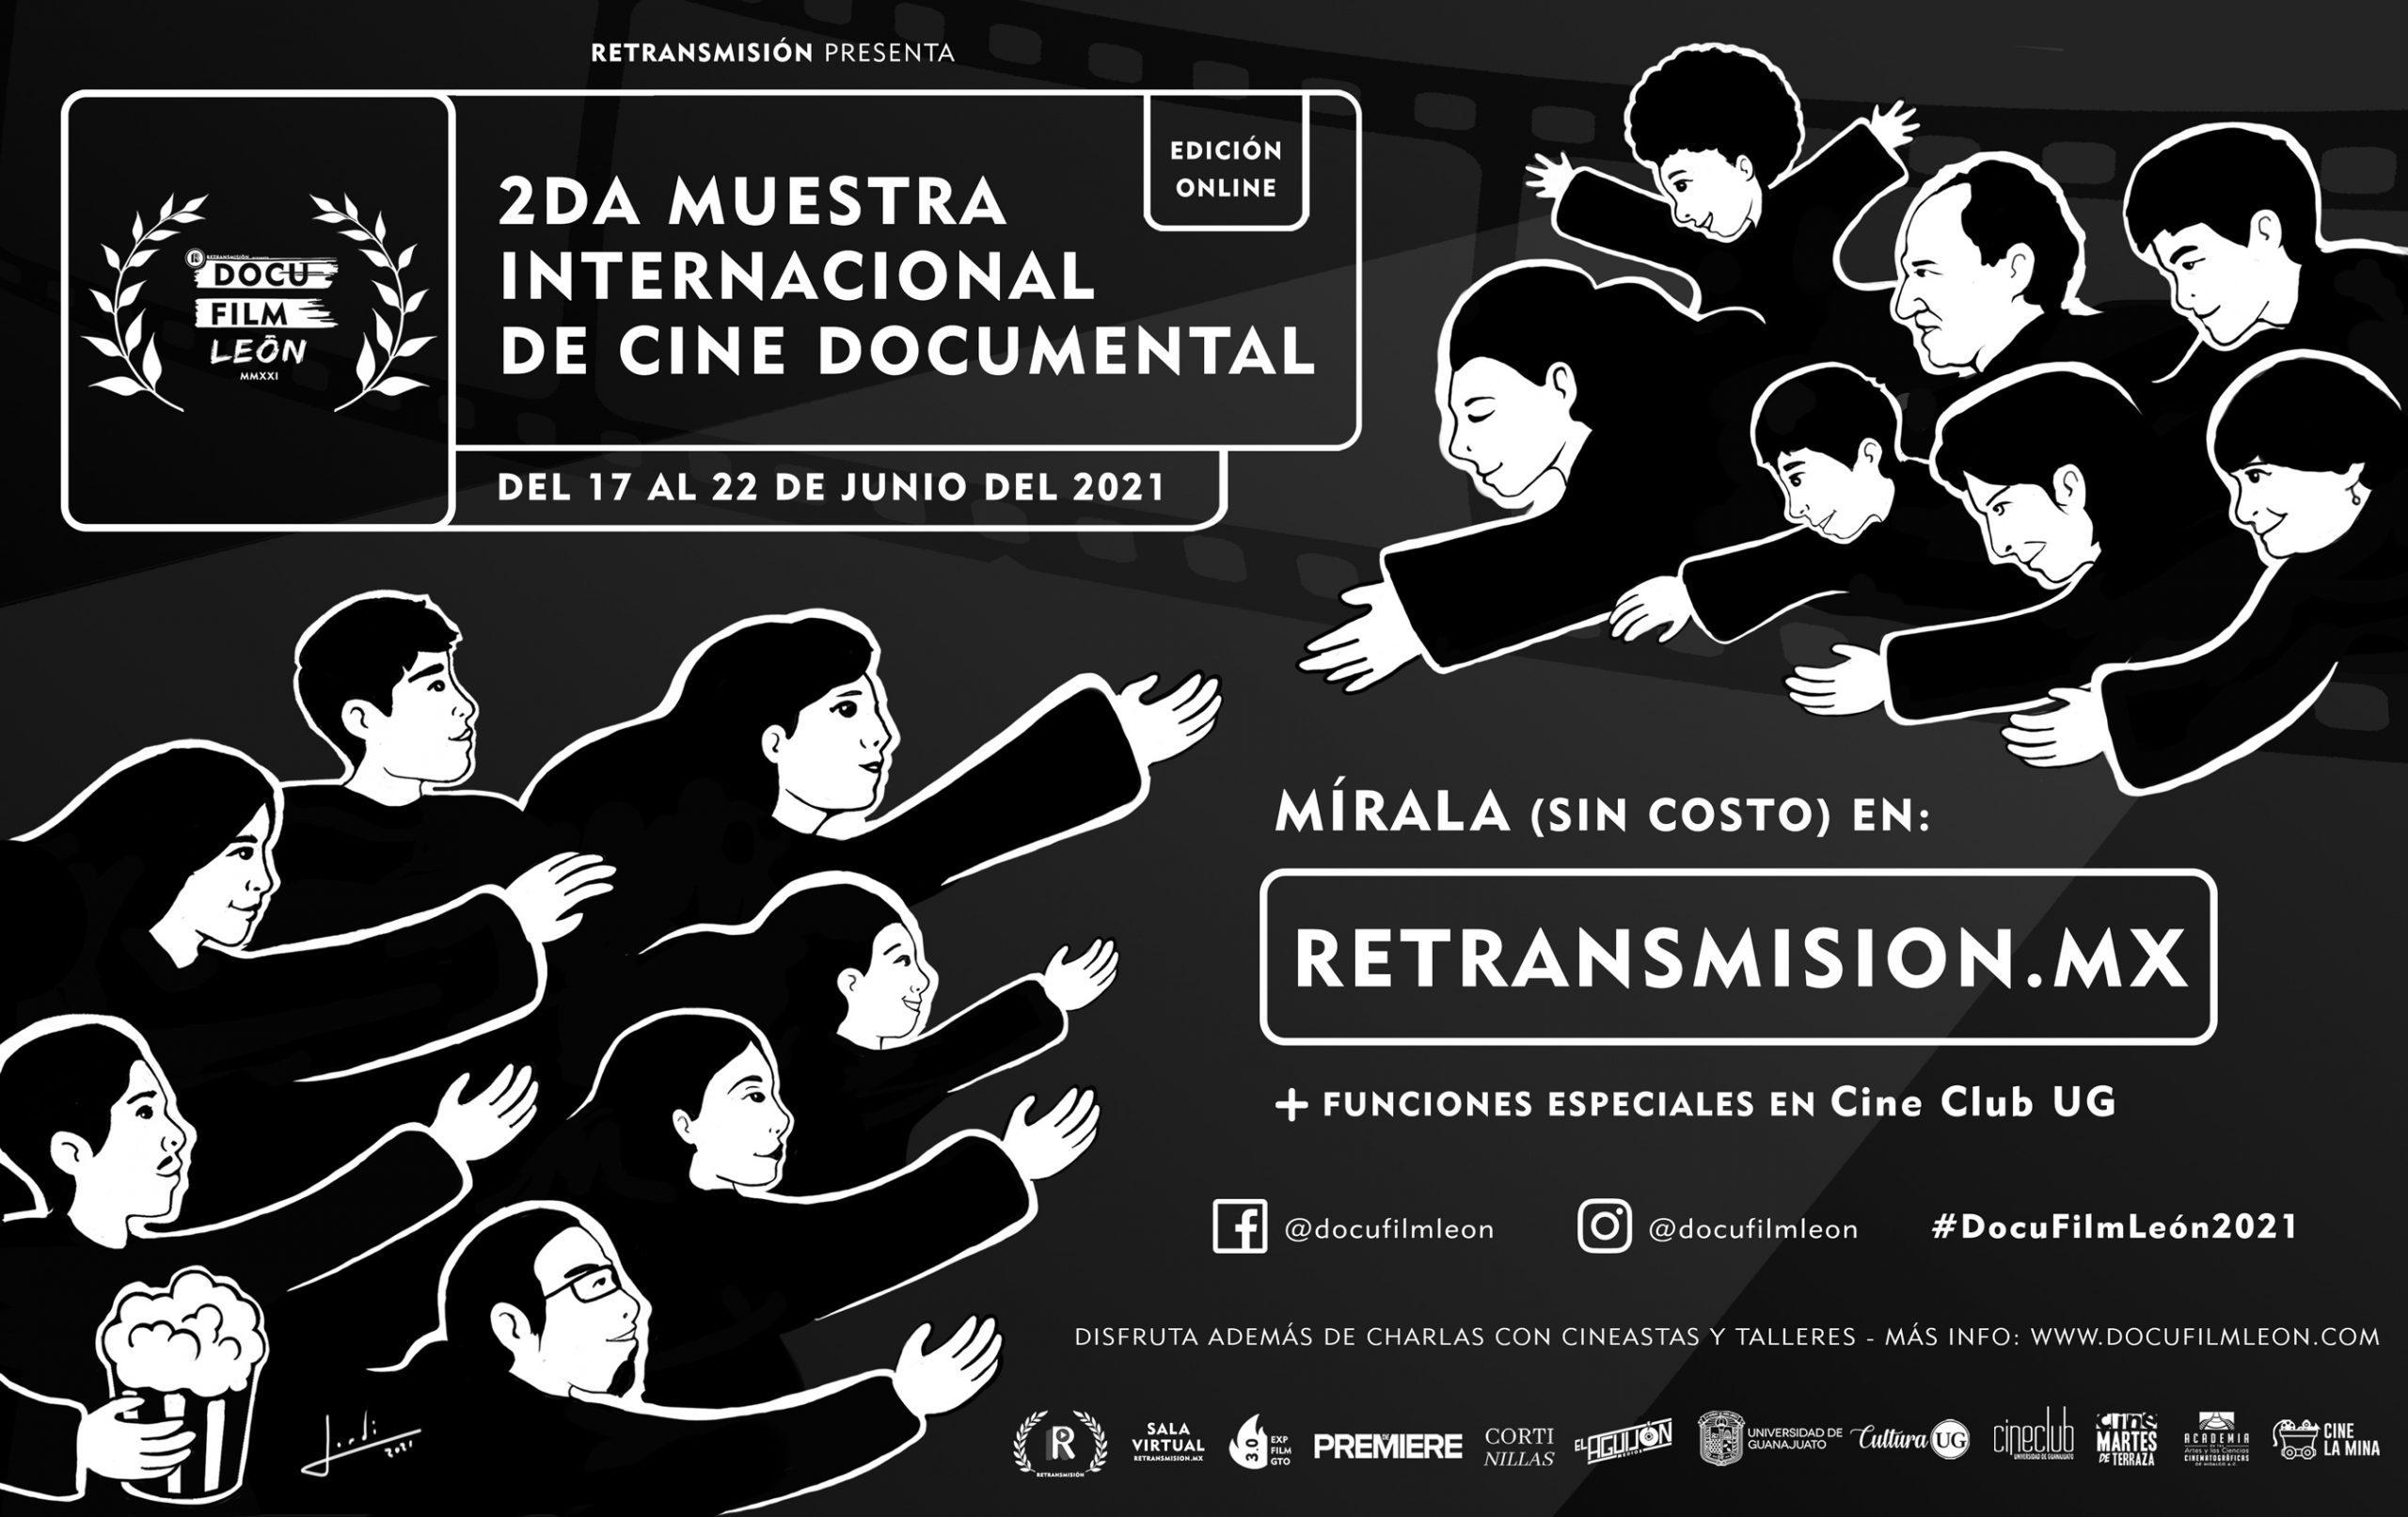 POSTER-PORTADA-COMPLETA-RETRANSMISIÓN-DOCU-FILM-LEON-2021